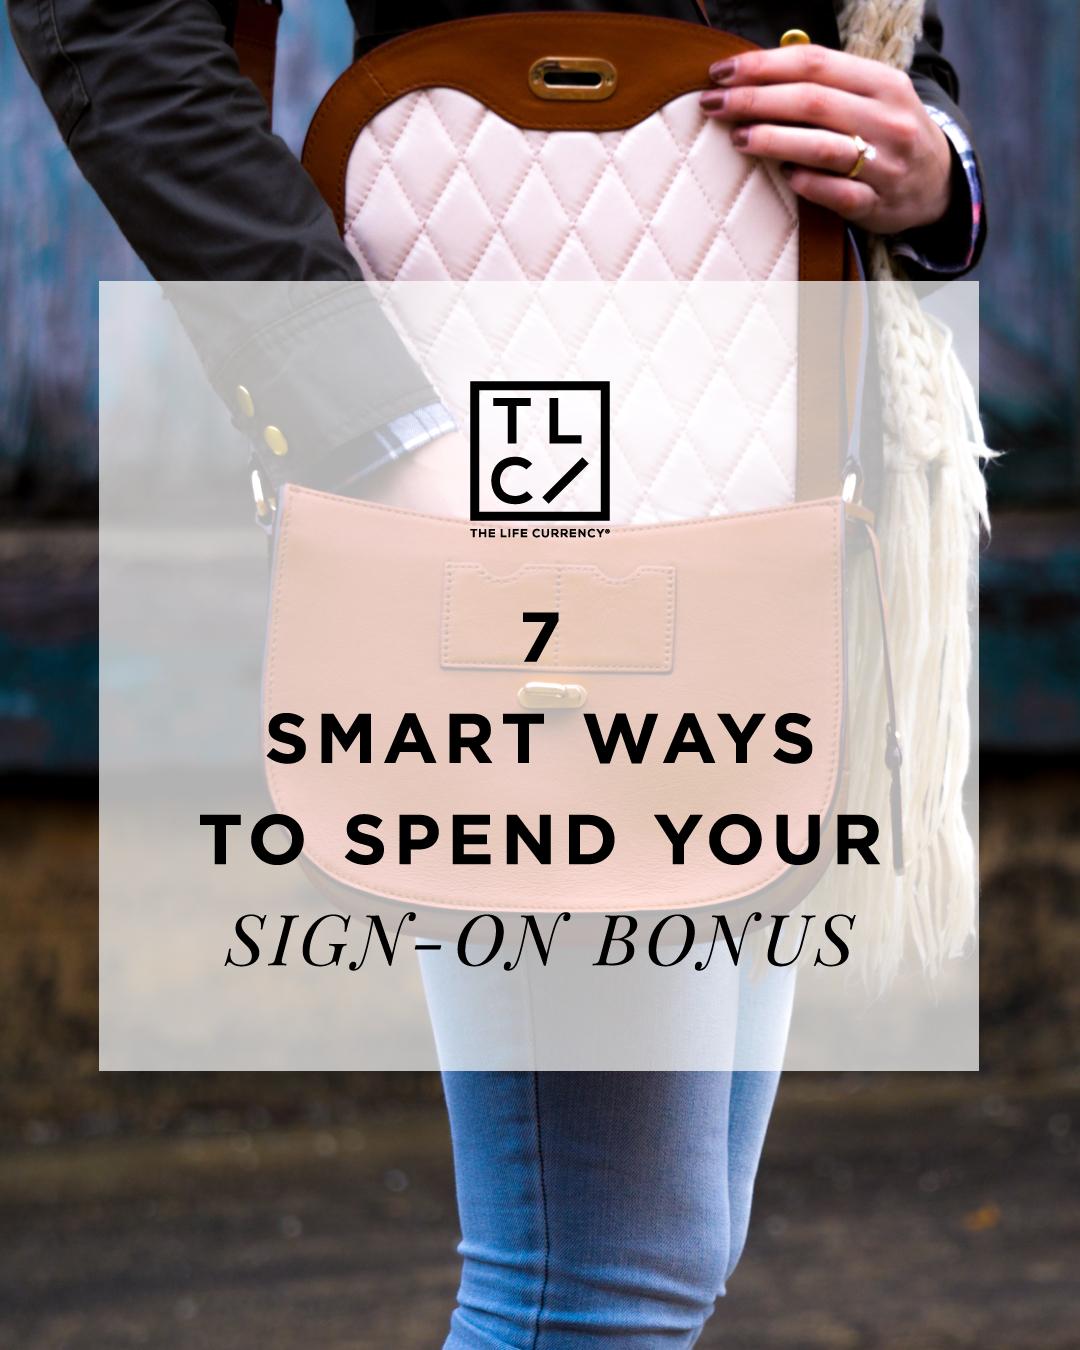 7 Smart Ways to Spend Your Sign-On Bonus